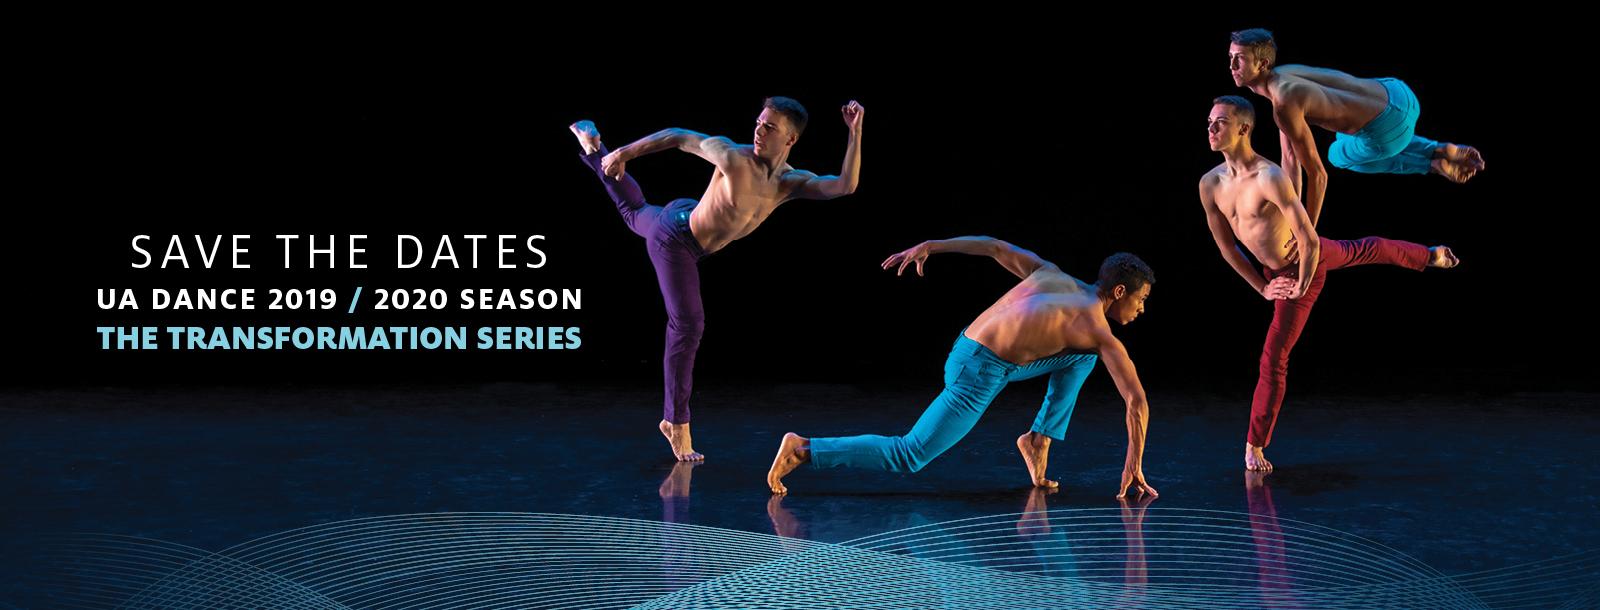 UA Dance 2019-20 Save the Dates